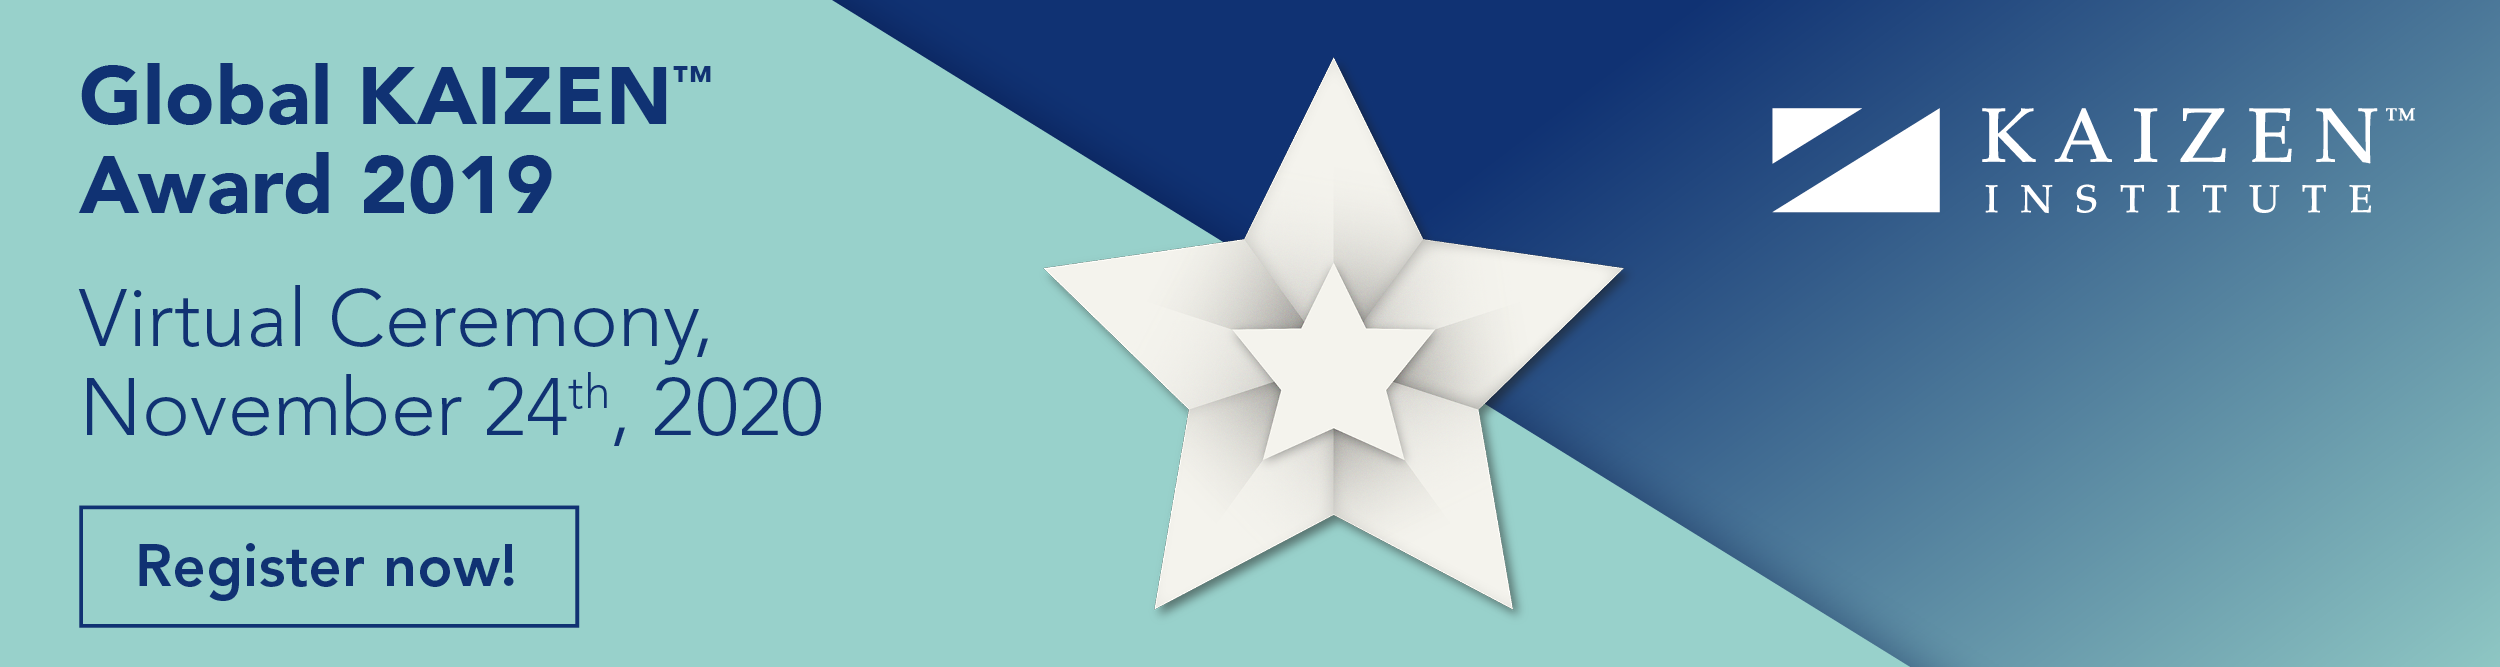 HubSpot Landing Page Global awards